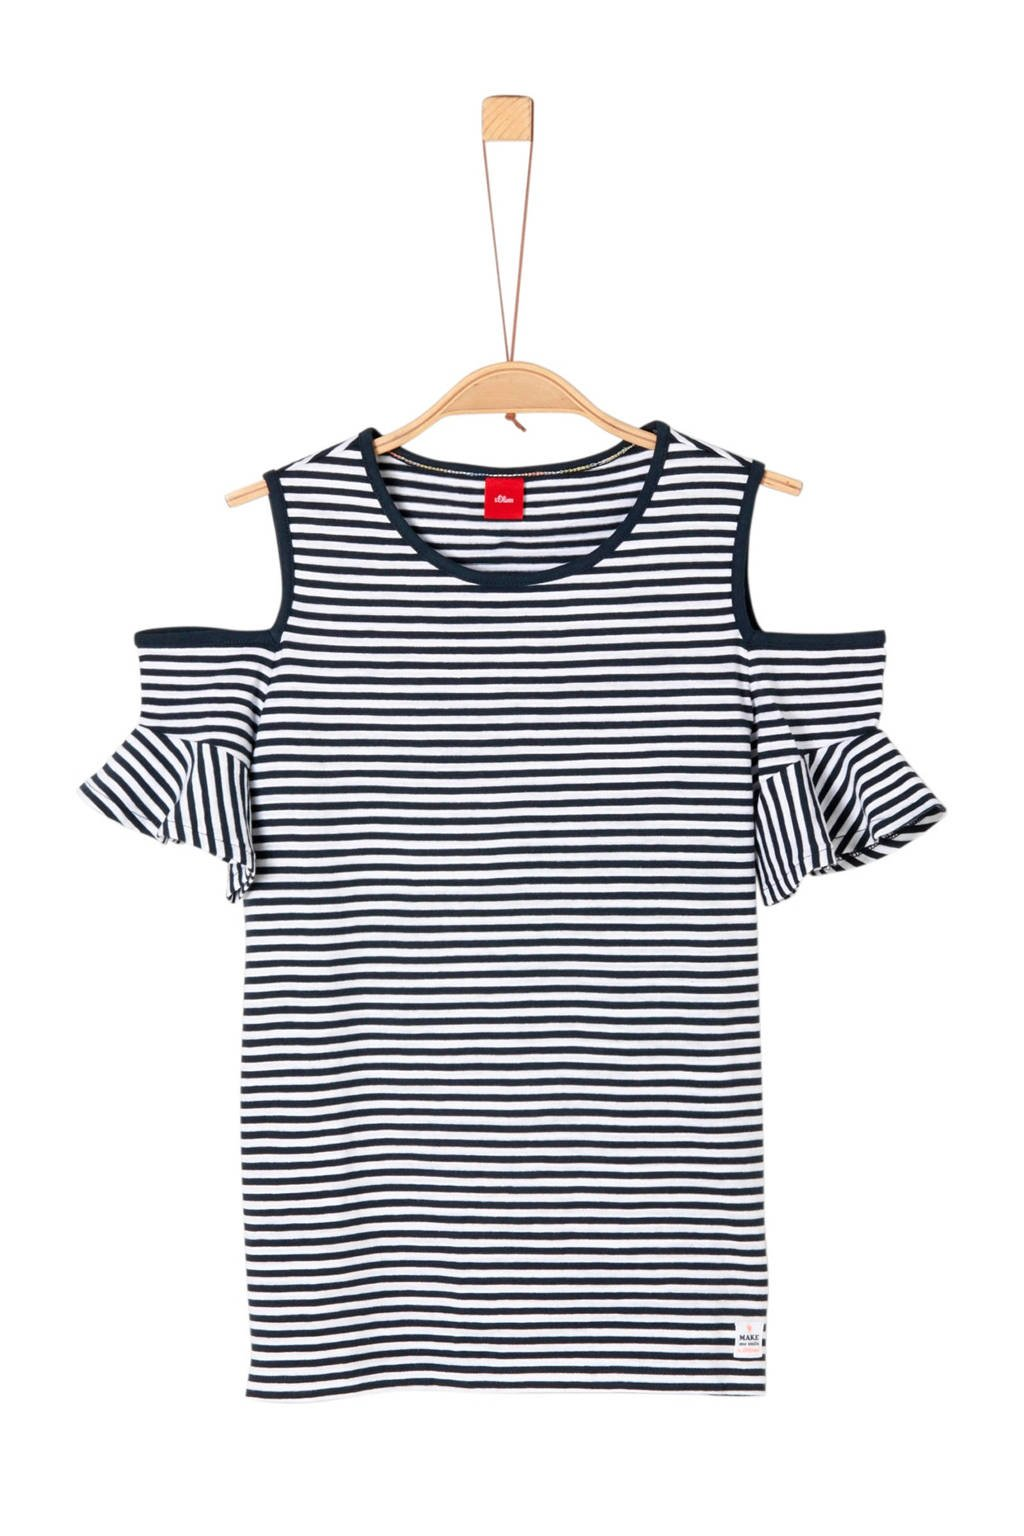 s.Oliver gestreept open shoulder T-shirt blauw, Donkerblauw/wit